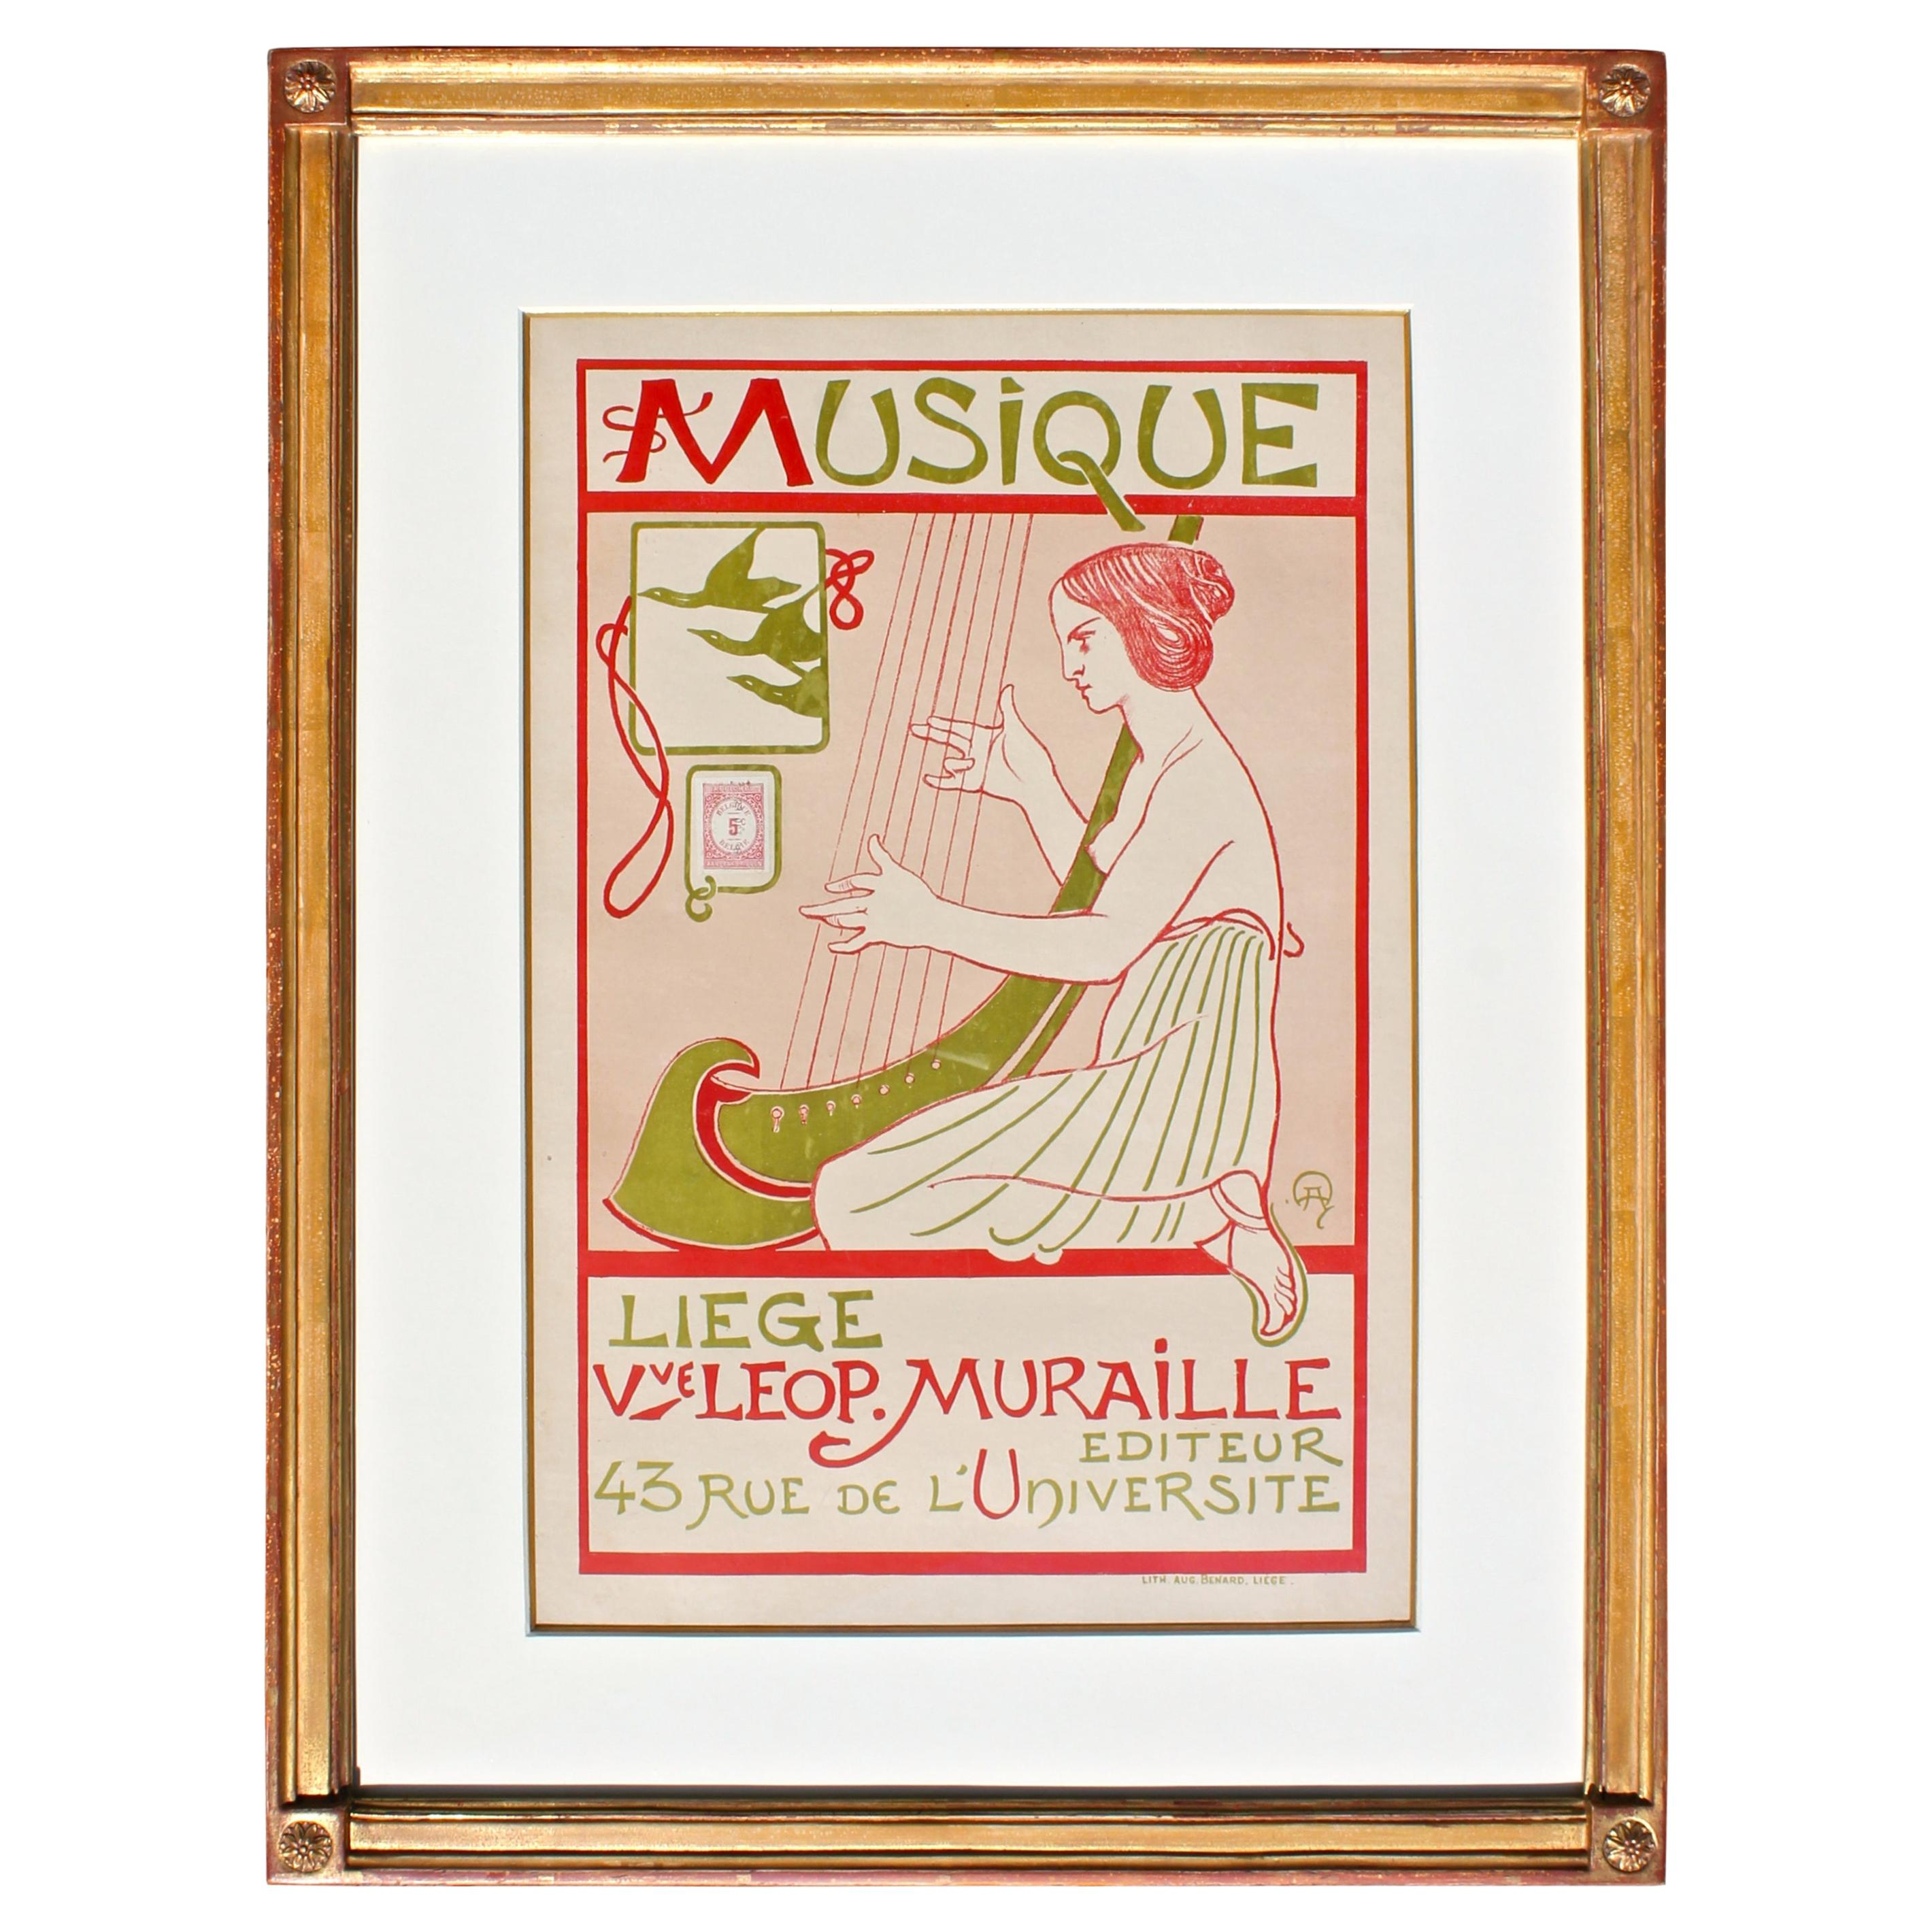 """Musique Liege"" Belgium Art Nouveau Poster c.1895 manner Alphonse Mucha"